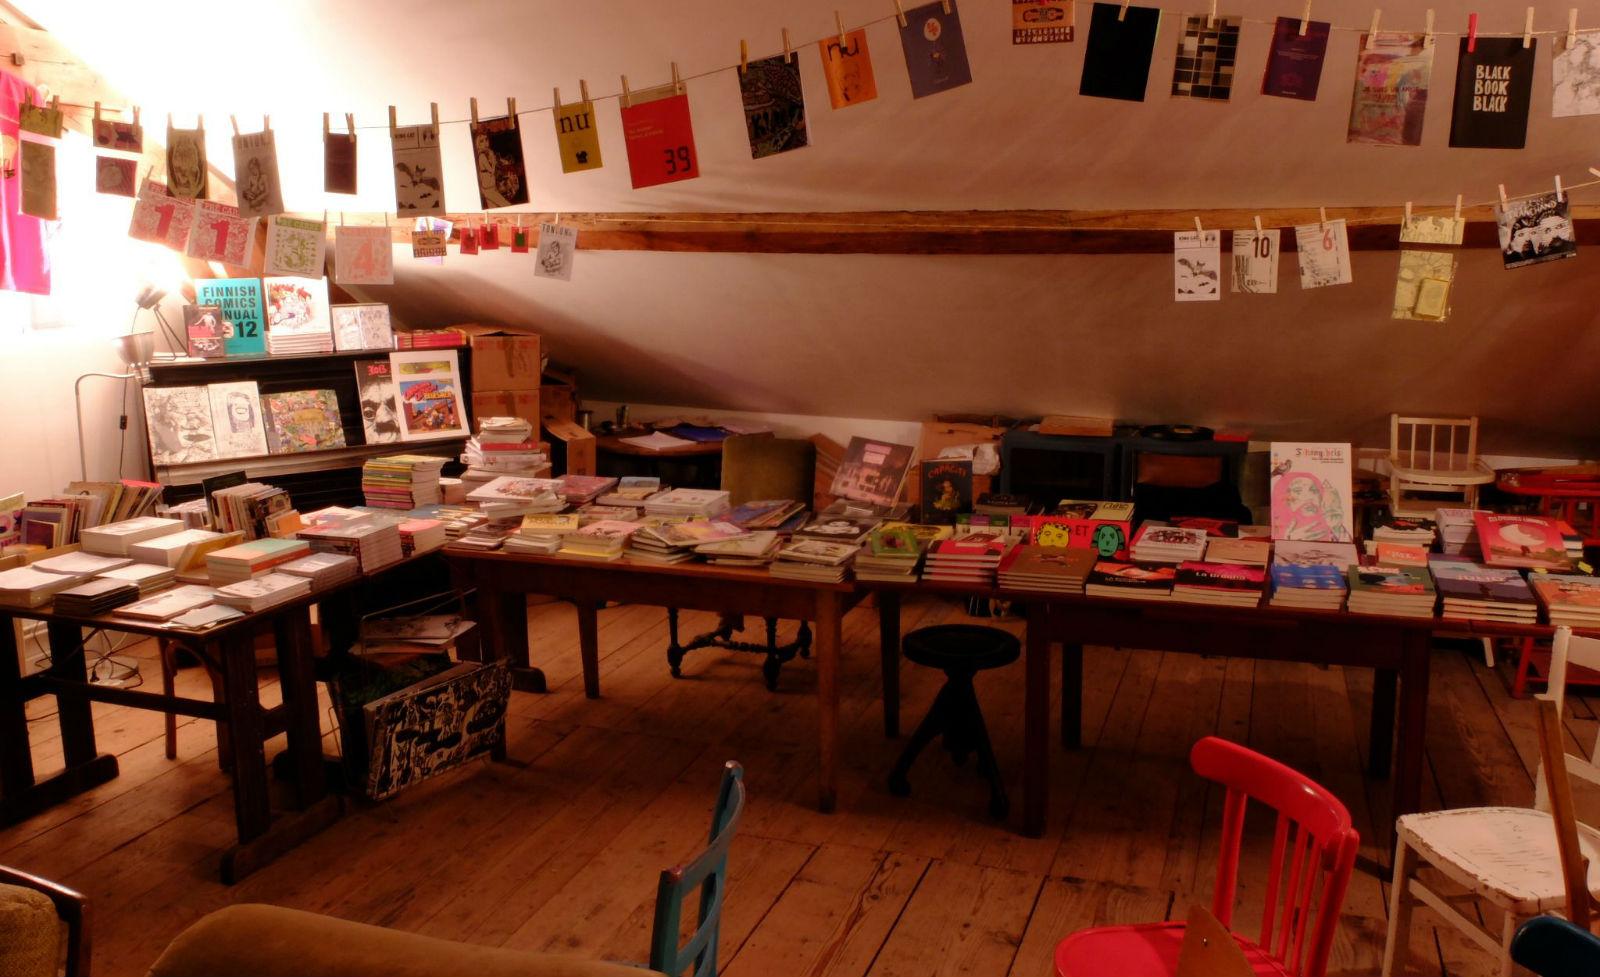 Week-end à L'Entrepot, vendredi soir: la Petite Librairie est prête!